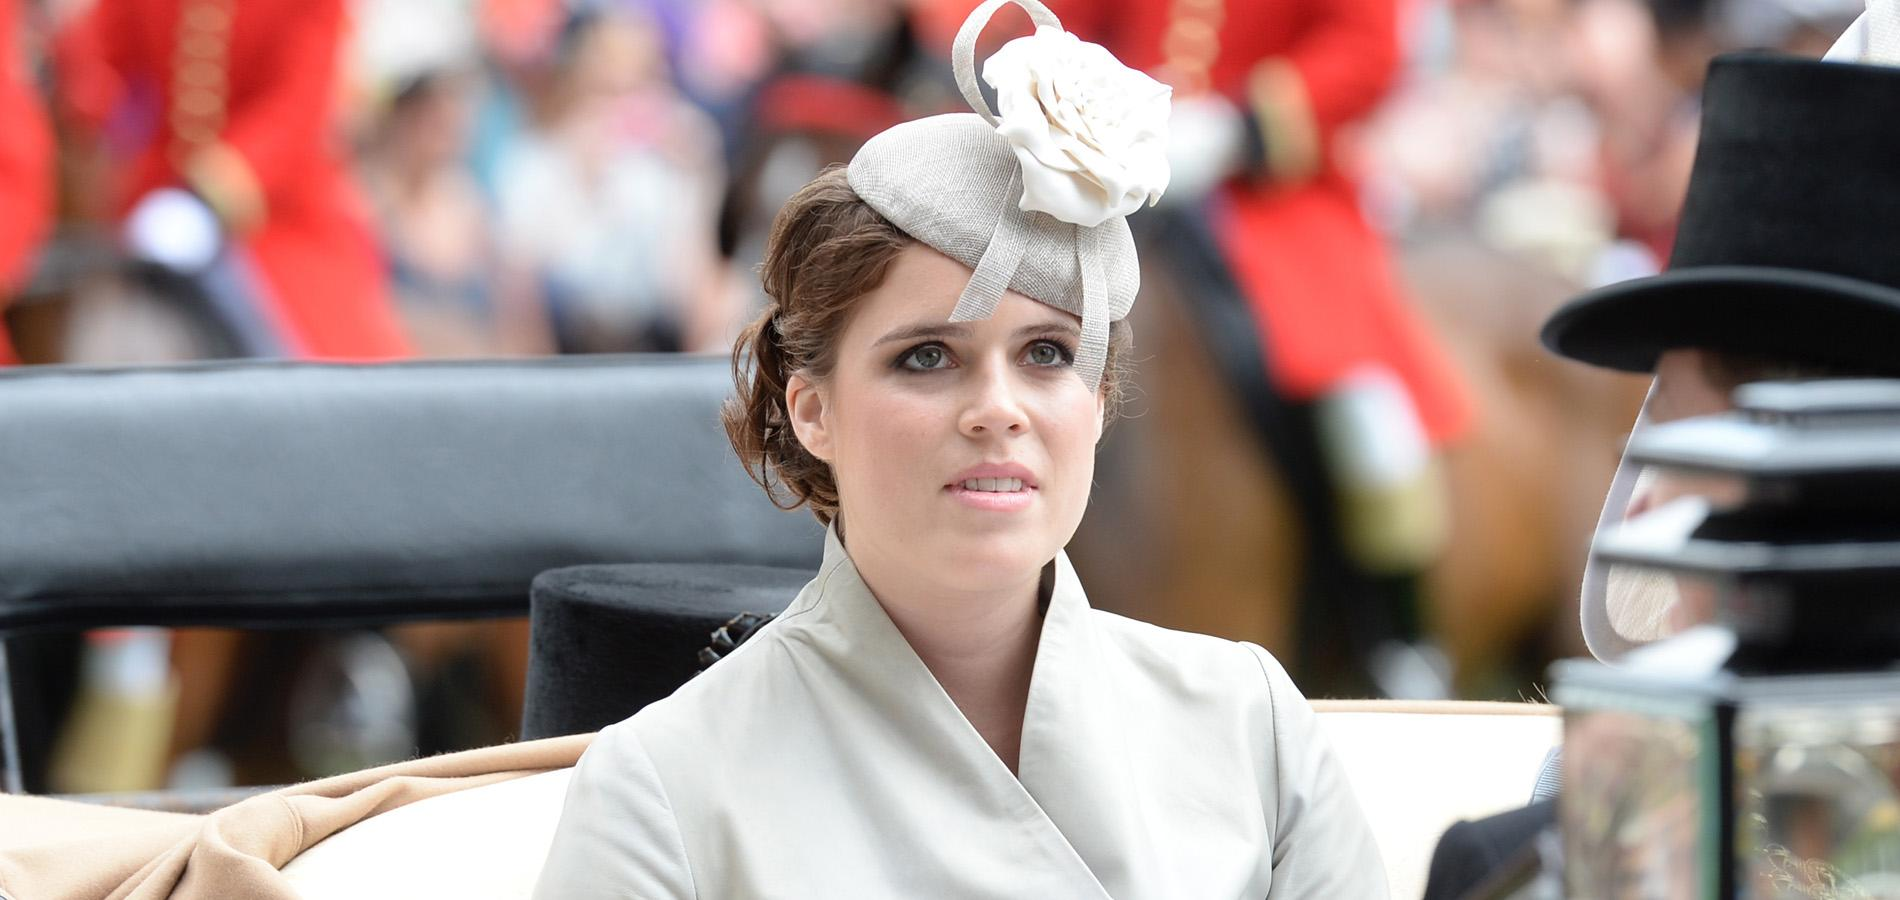 Mariage de la princesse Eugenie : Elizabeth II sera présente, la BBC refuse la retransmission